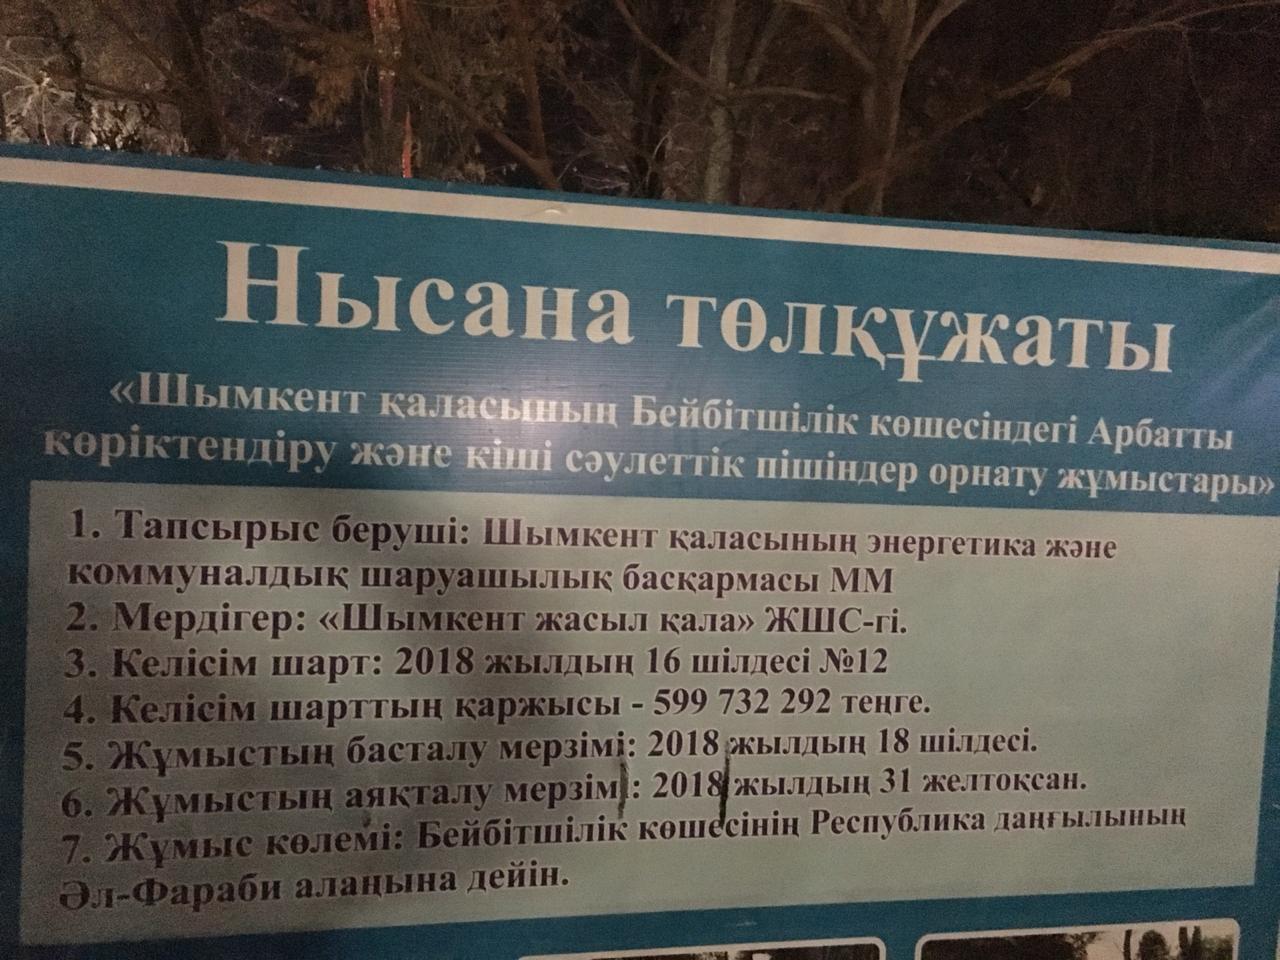 https://inbusiness.kz/ru/images/original/31/images/lUgWI68L.jpg